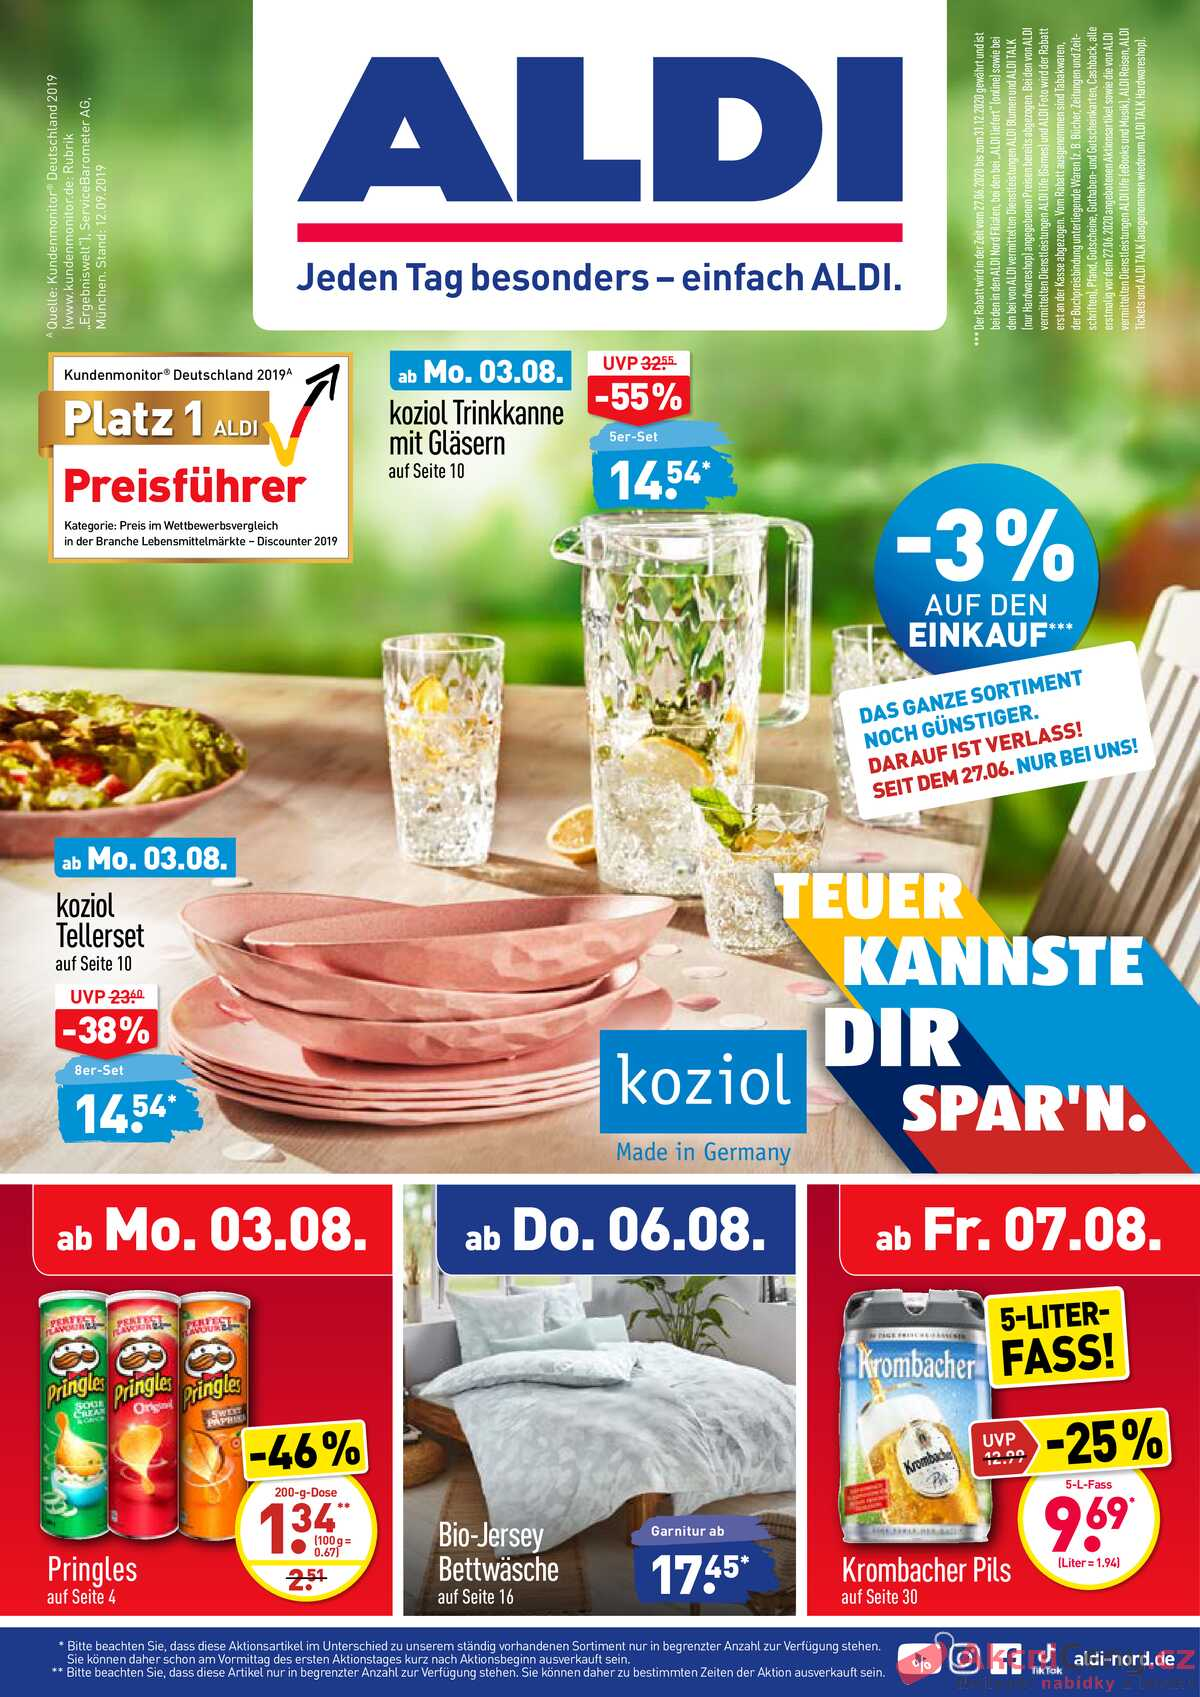 Leták Aldi Deutschland strana 1/32